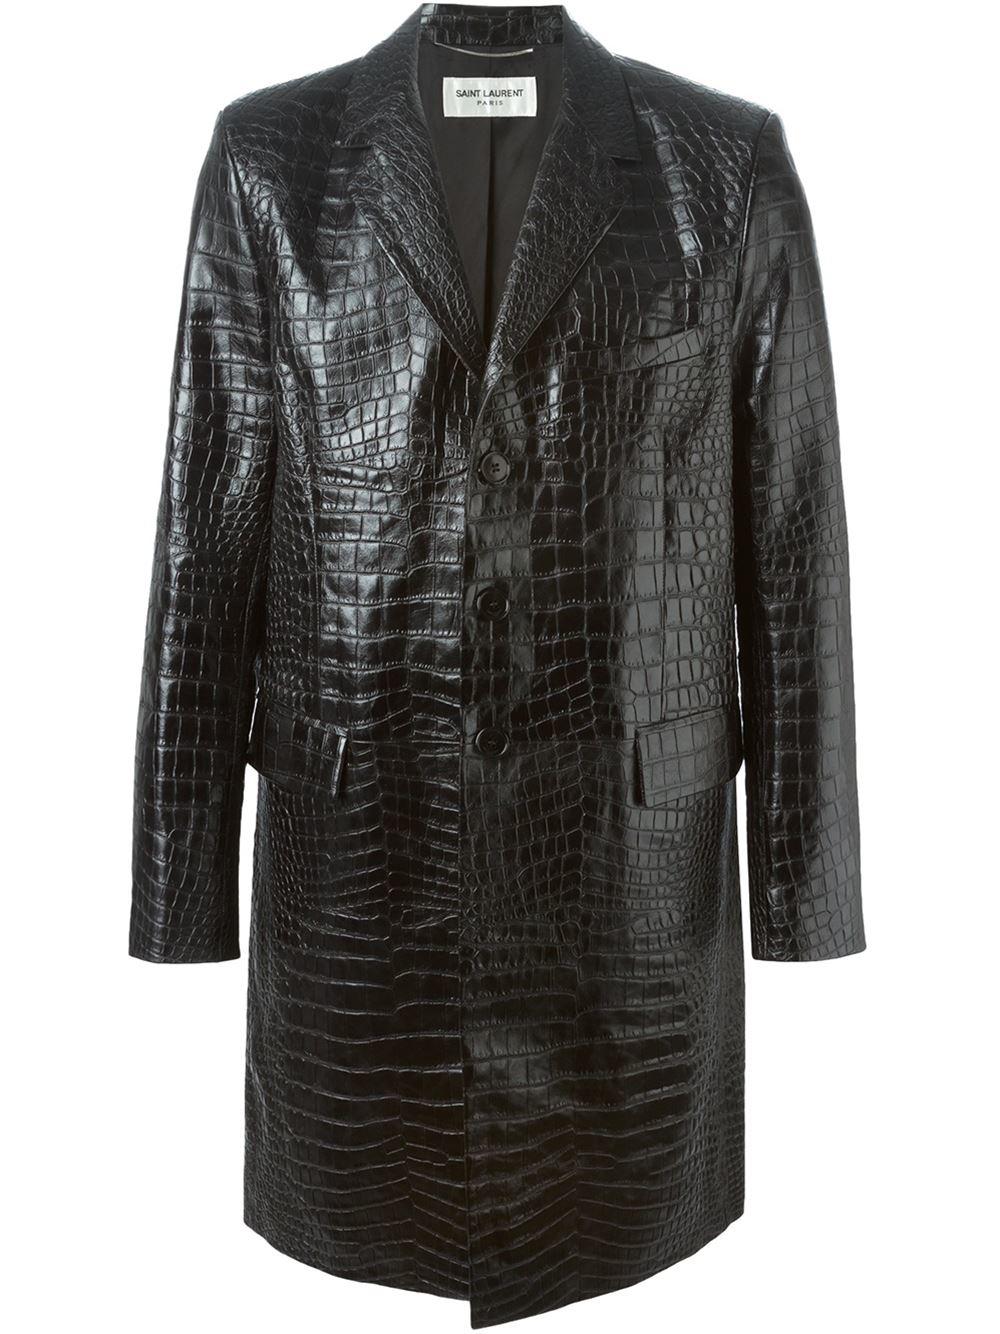 Saint Laurent Crocodile Embossed Coat In Black For Men Lyst